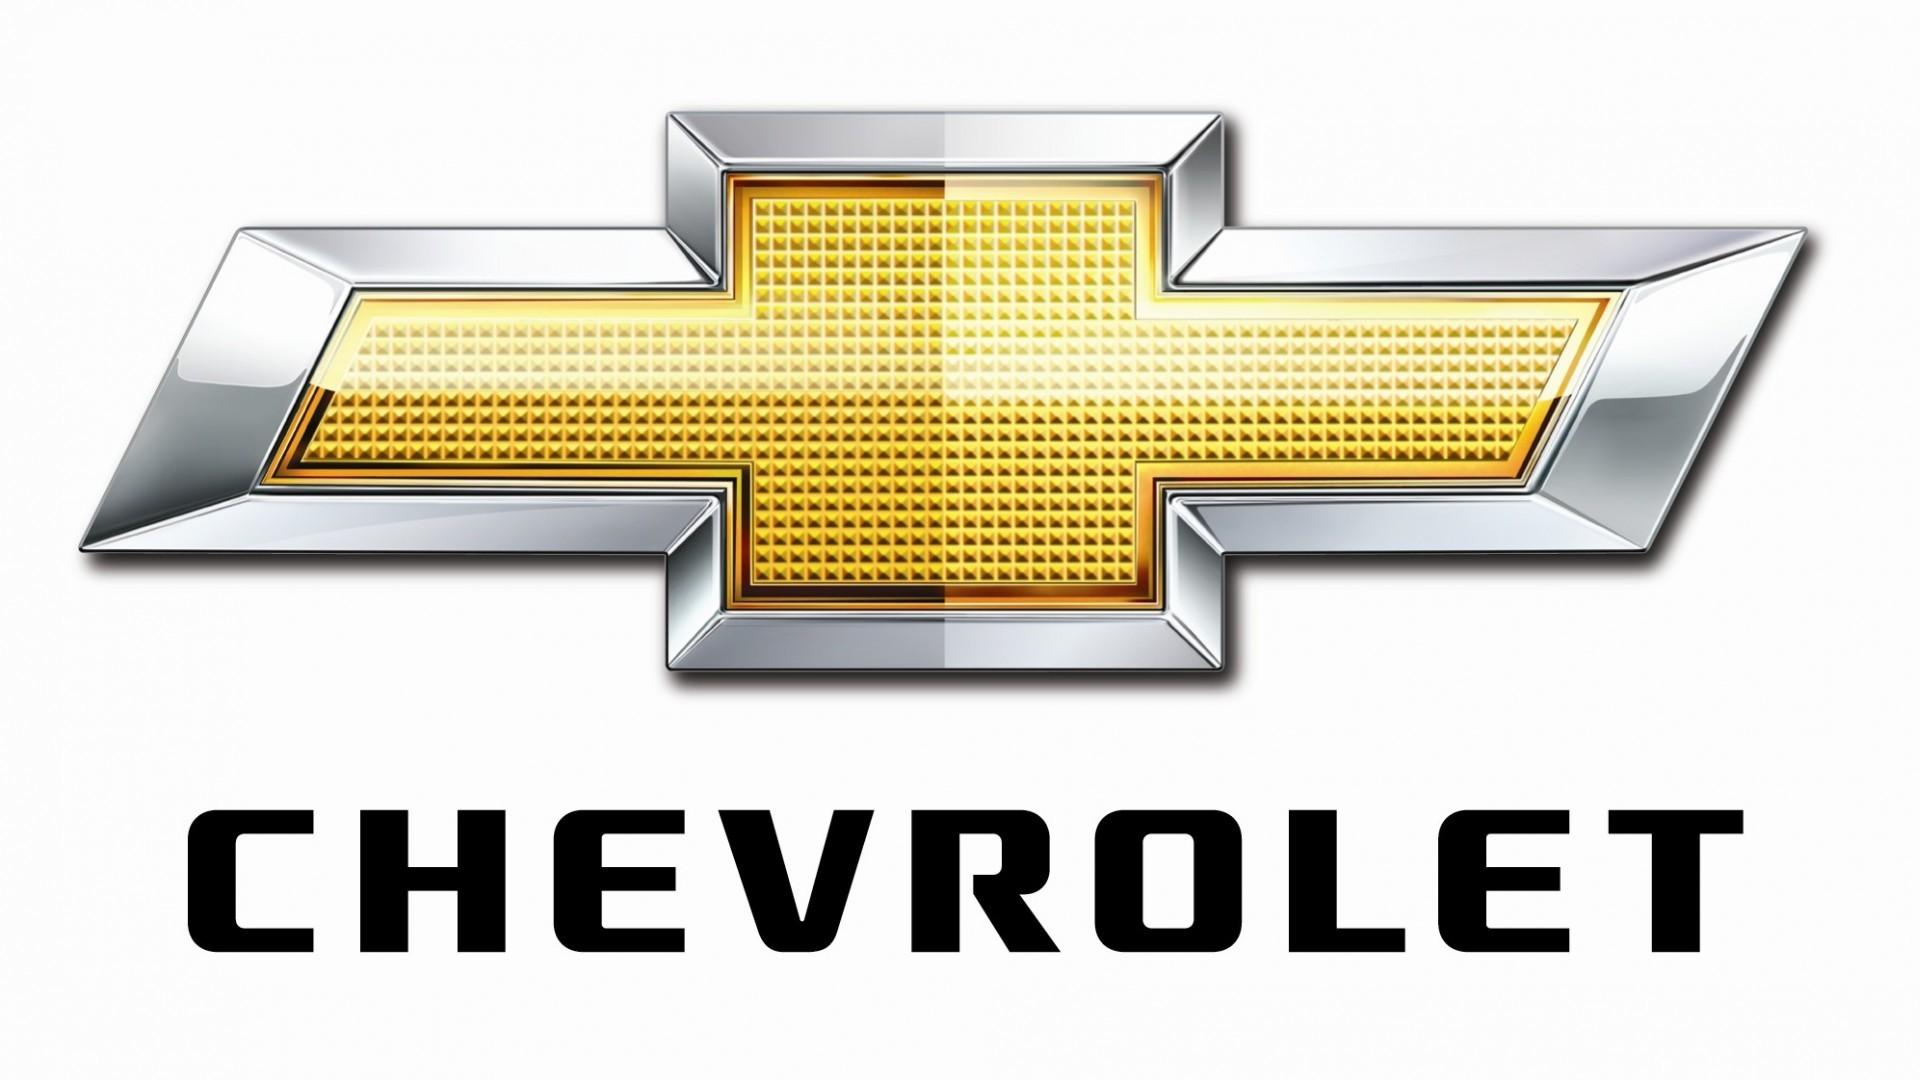 1920x1080 Image for Chevrolet Logo Vector 2015 Car Wallpaper HD